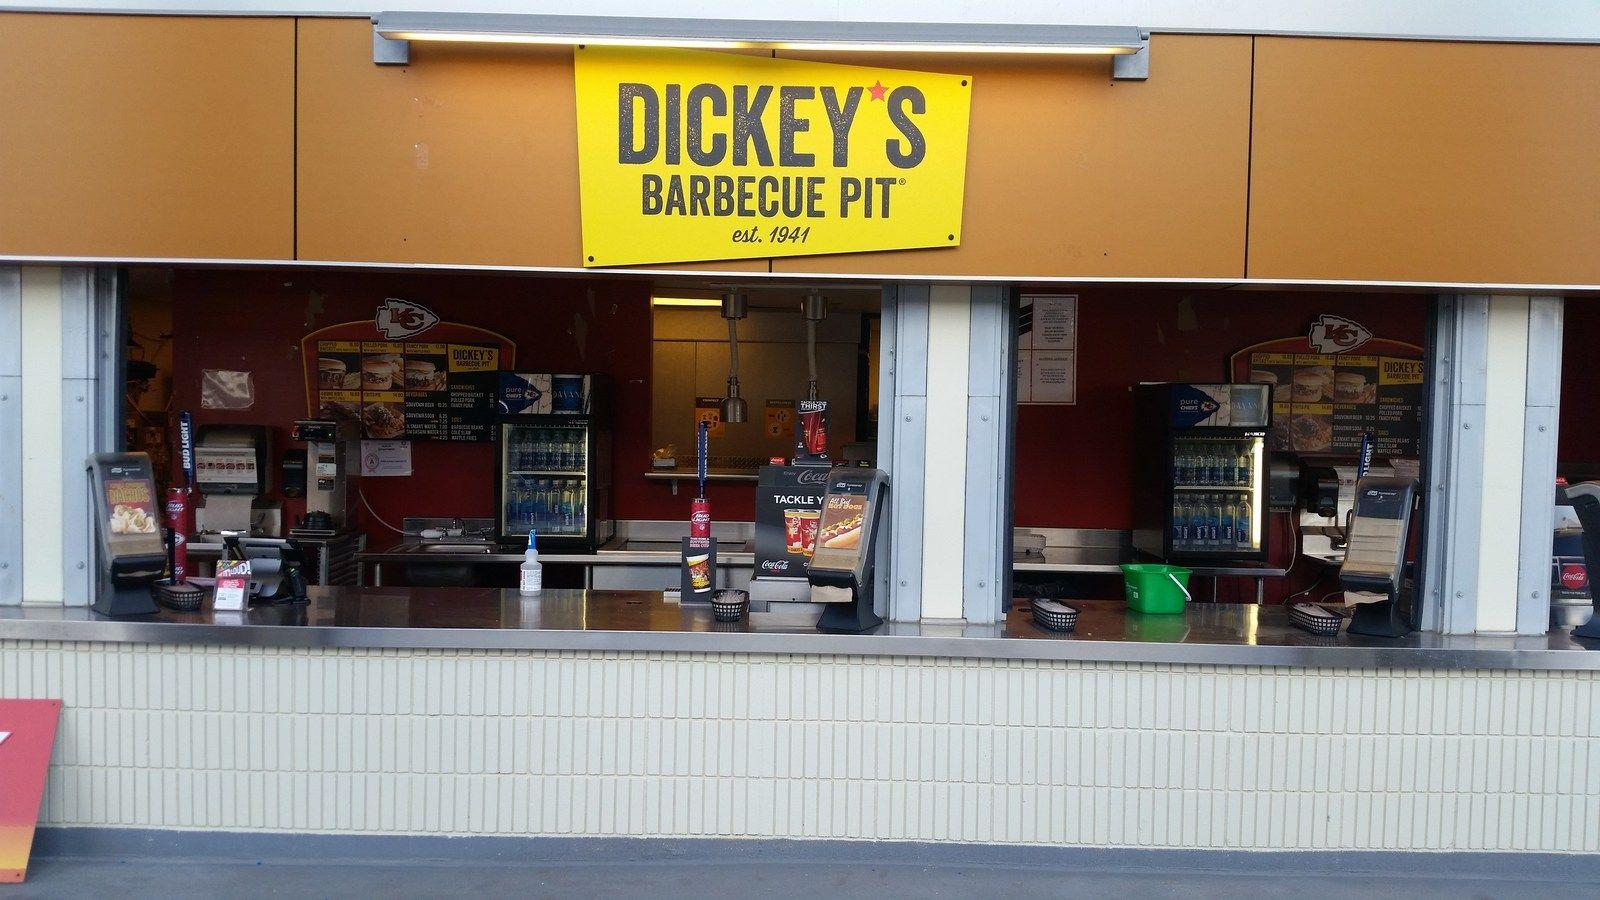 Dickey's Barbecue Pit Scores at Arrowhead Stadium in Kansas City, MO